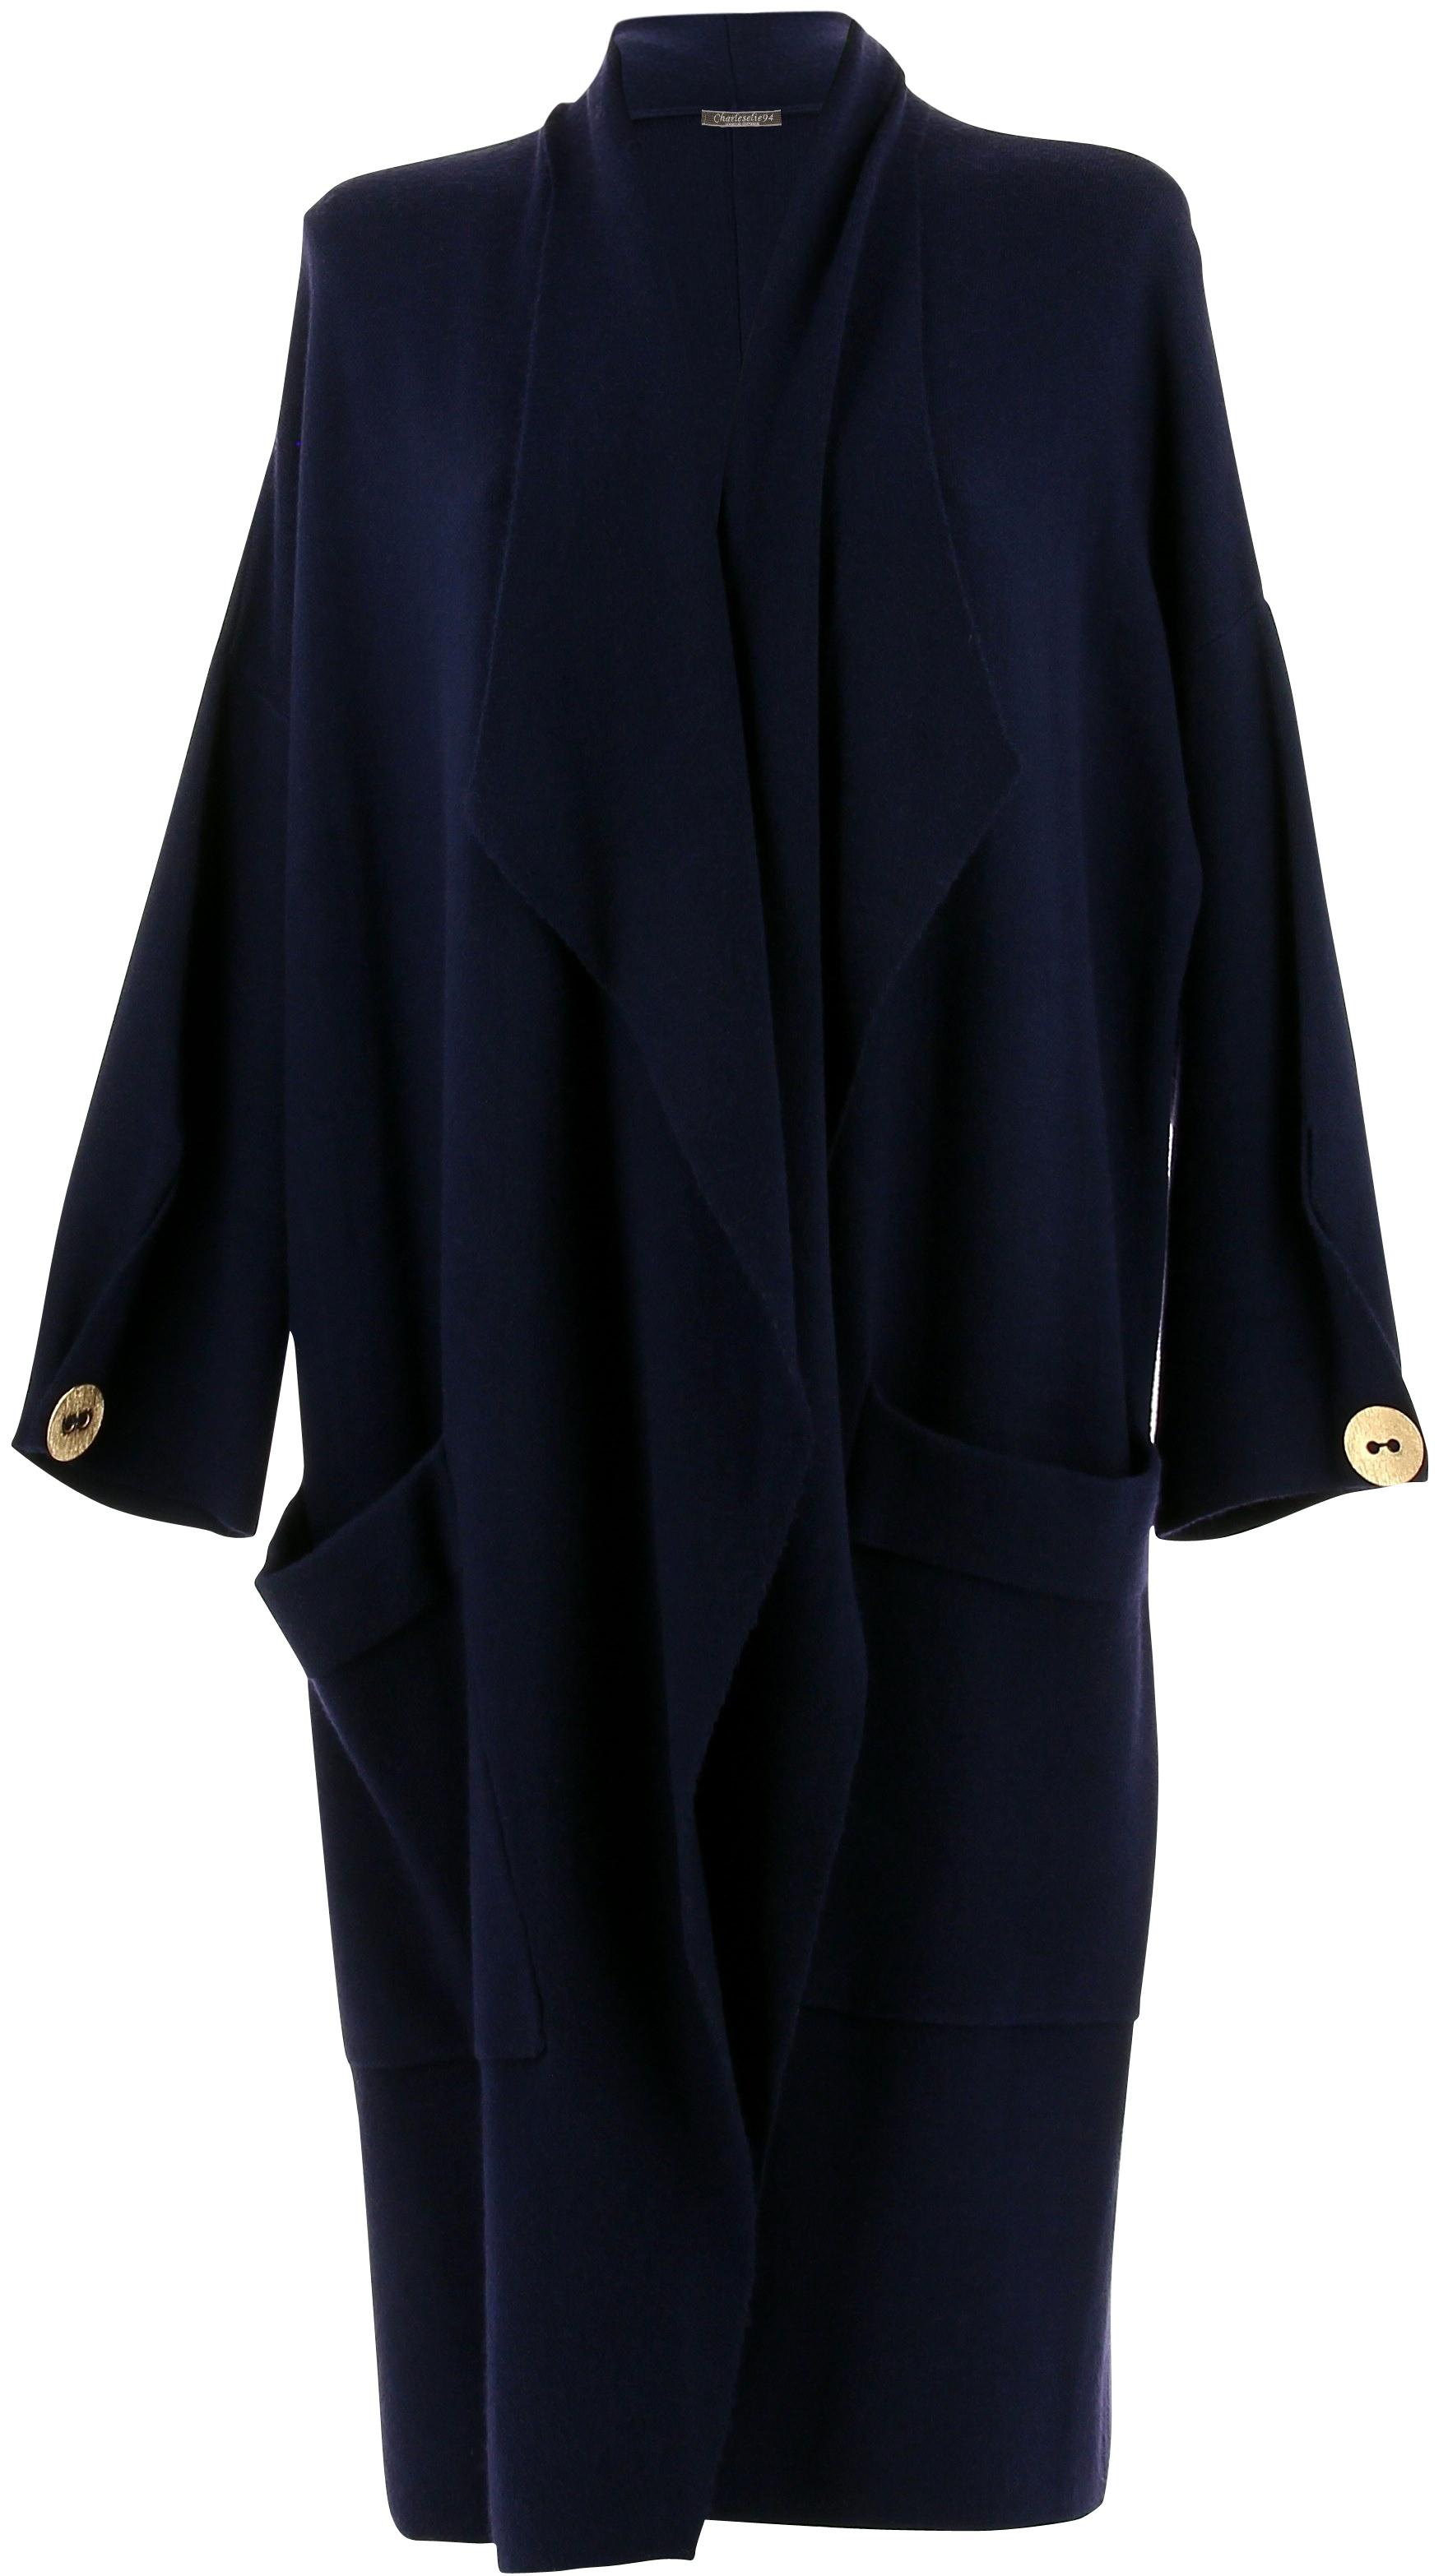 Manteau femme grande taille hiver bleu marine LUIGI